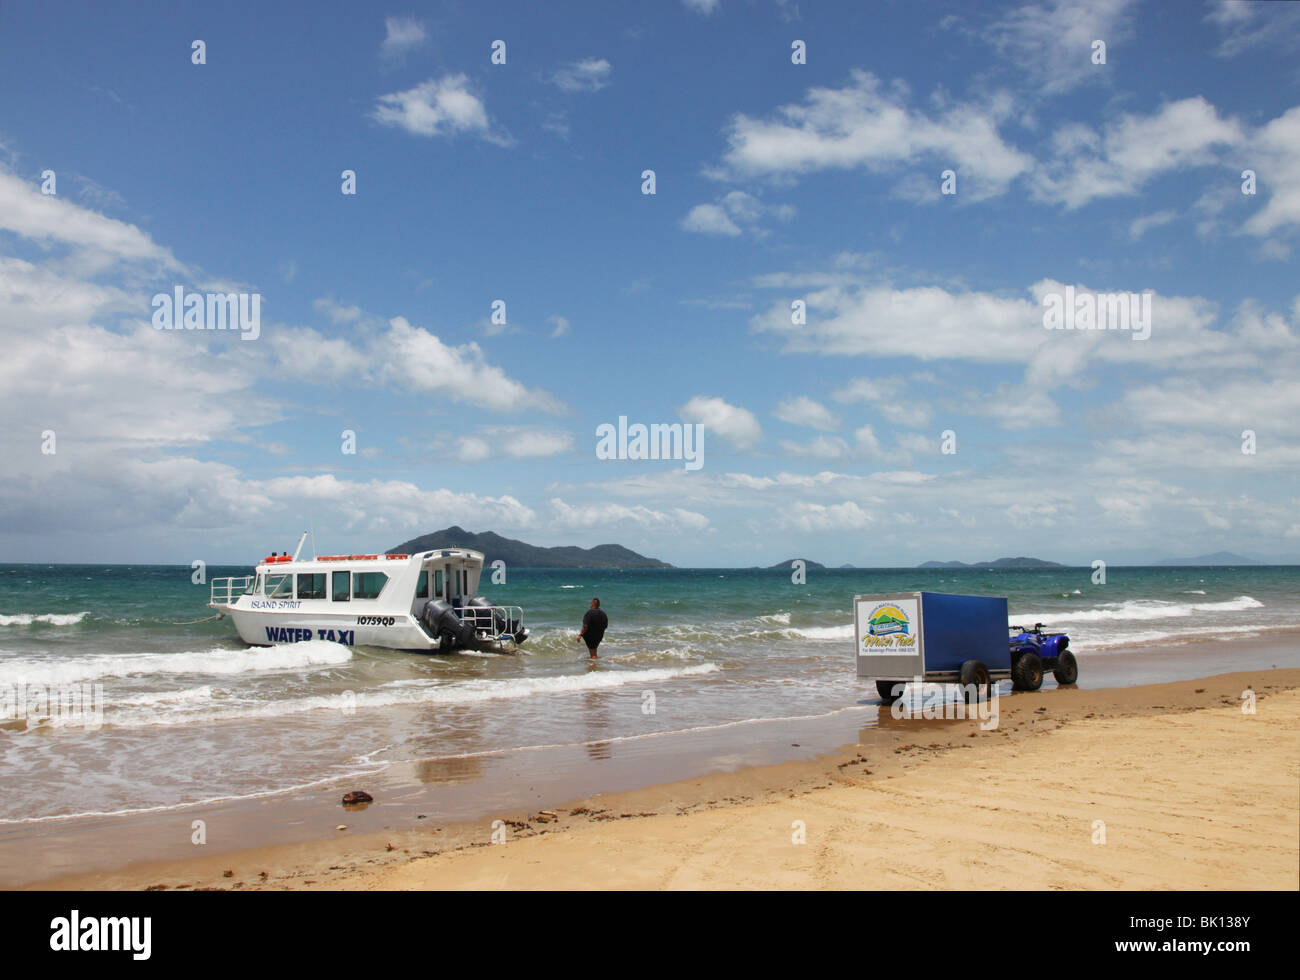 Dunk Island Holidays: Dunk Island Stock Photos & Dunk Island Stock Images